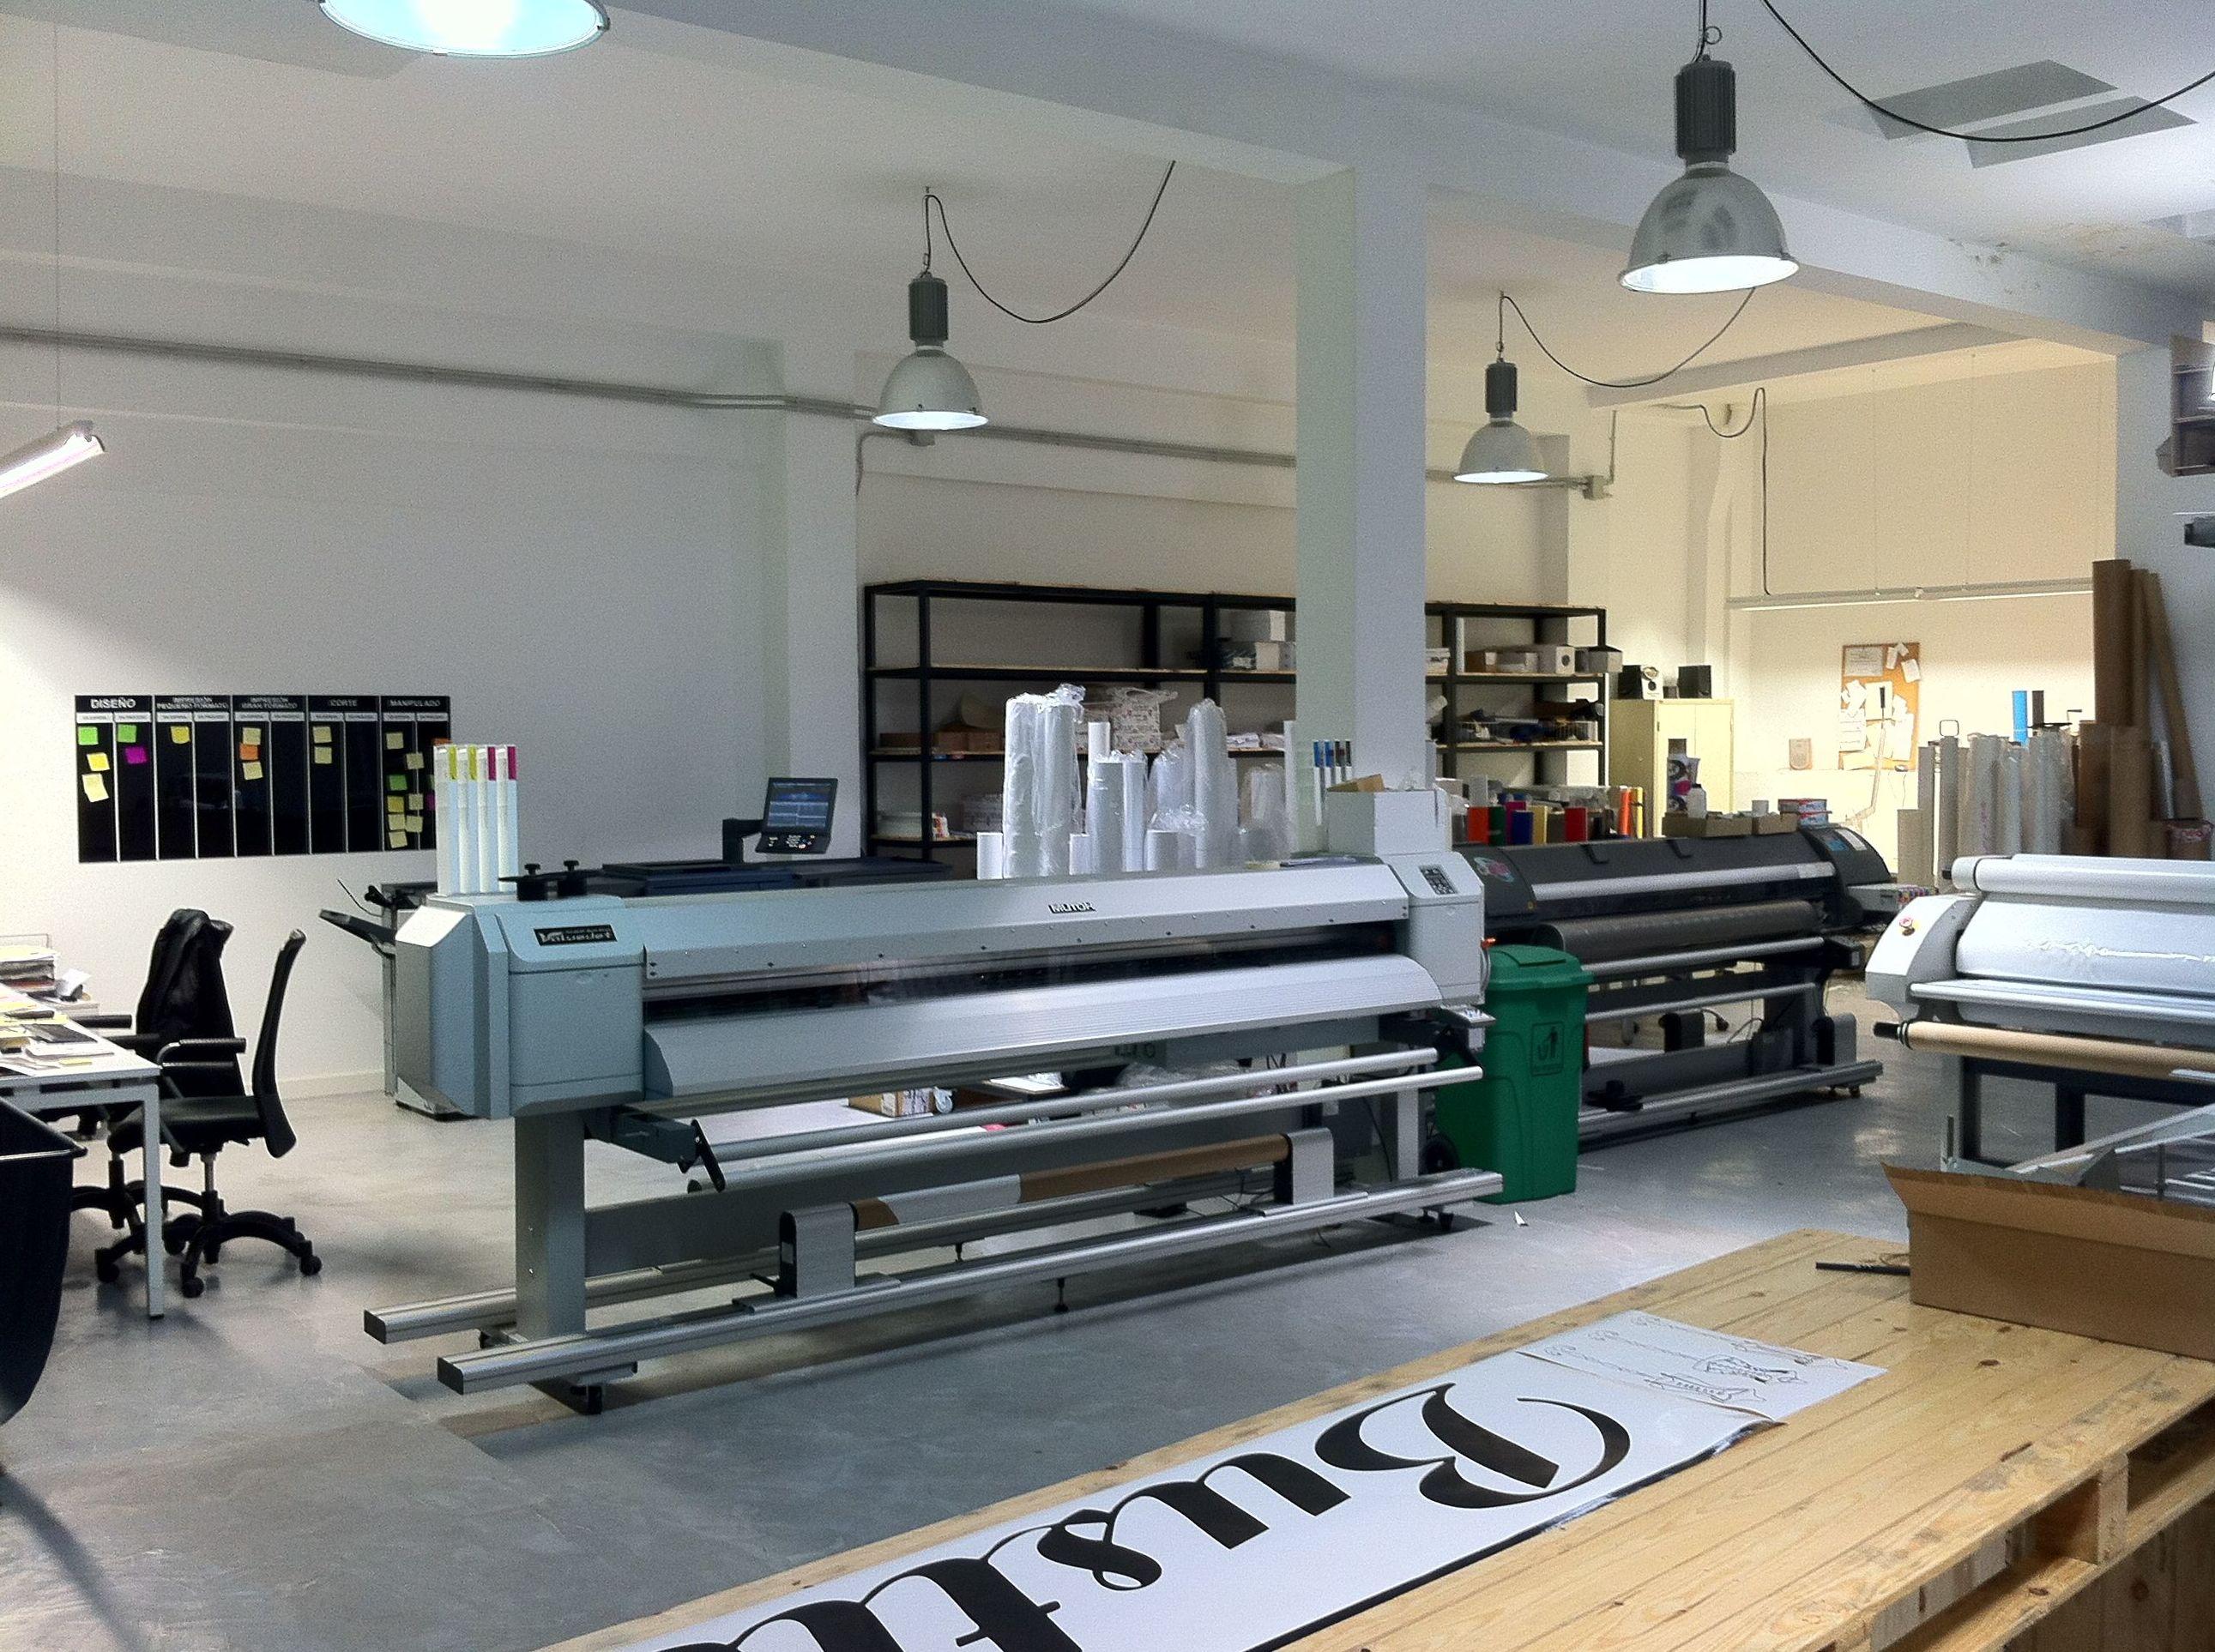 Impresión Digital Gran Formato Mutoh Spirfire 1600 mm. ancho y Mutoh ValuaJet VJ2638 de 2500 mm. ancho